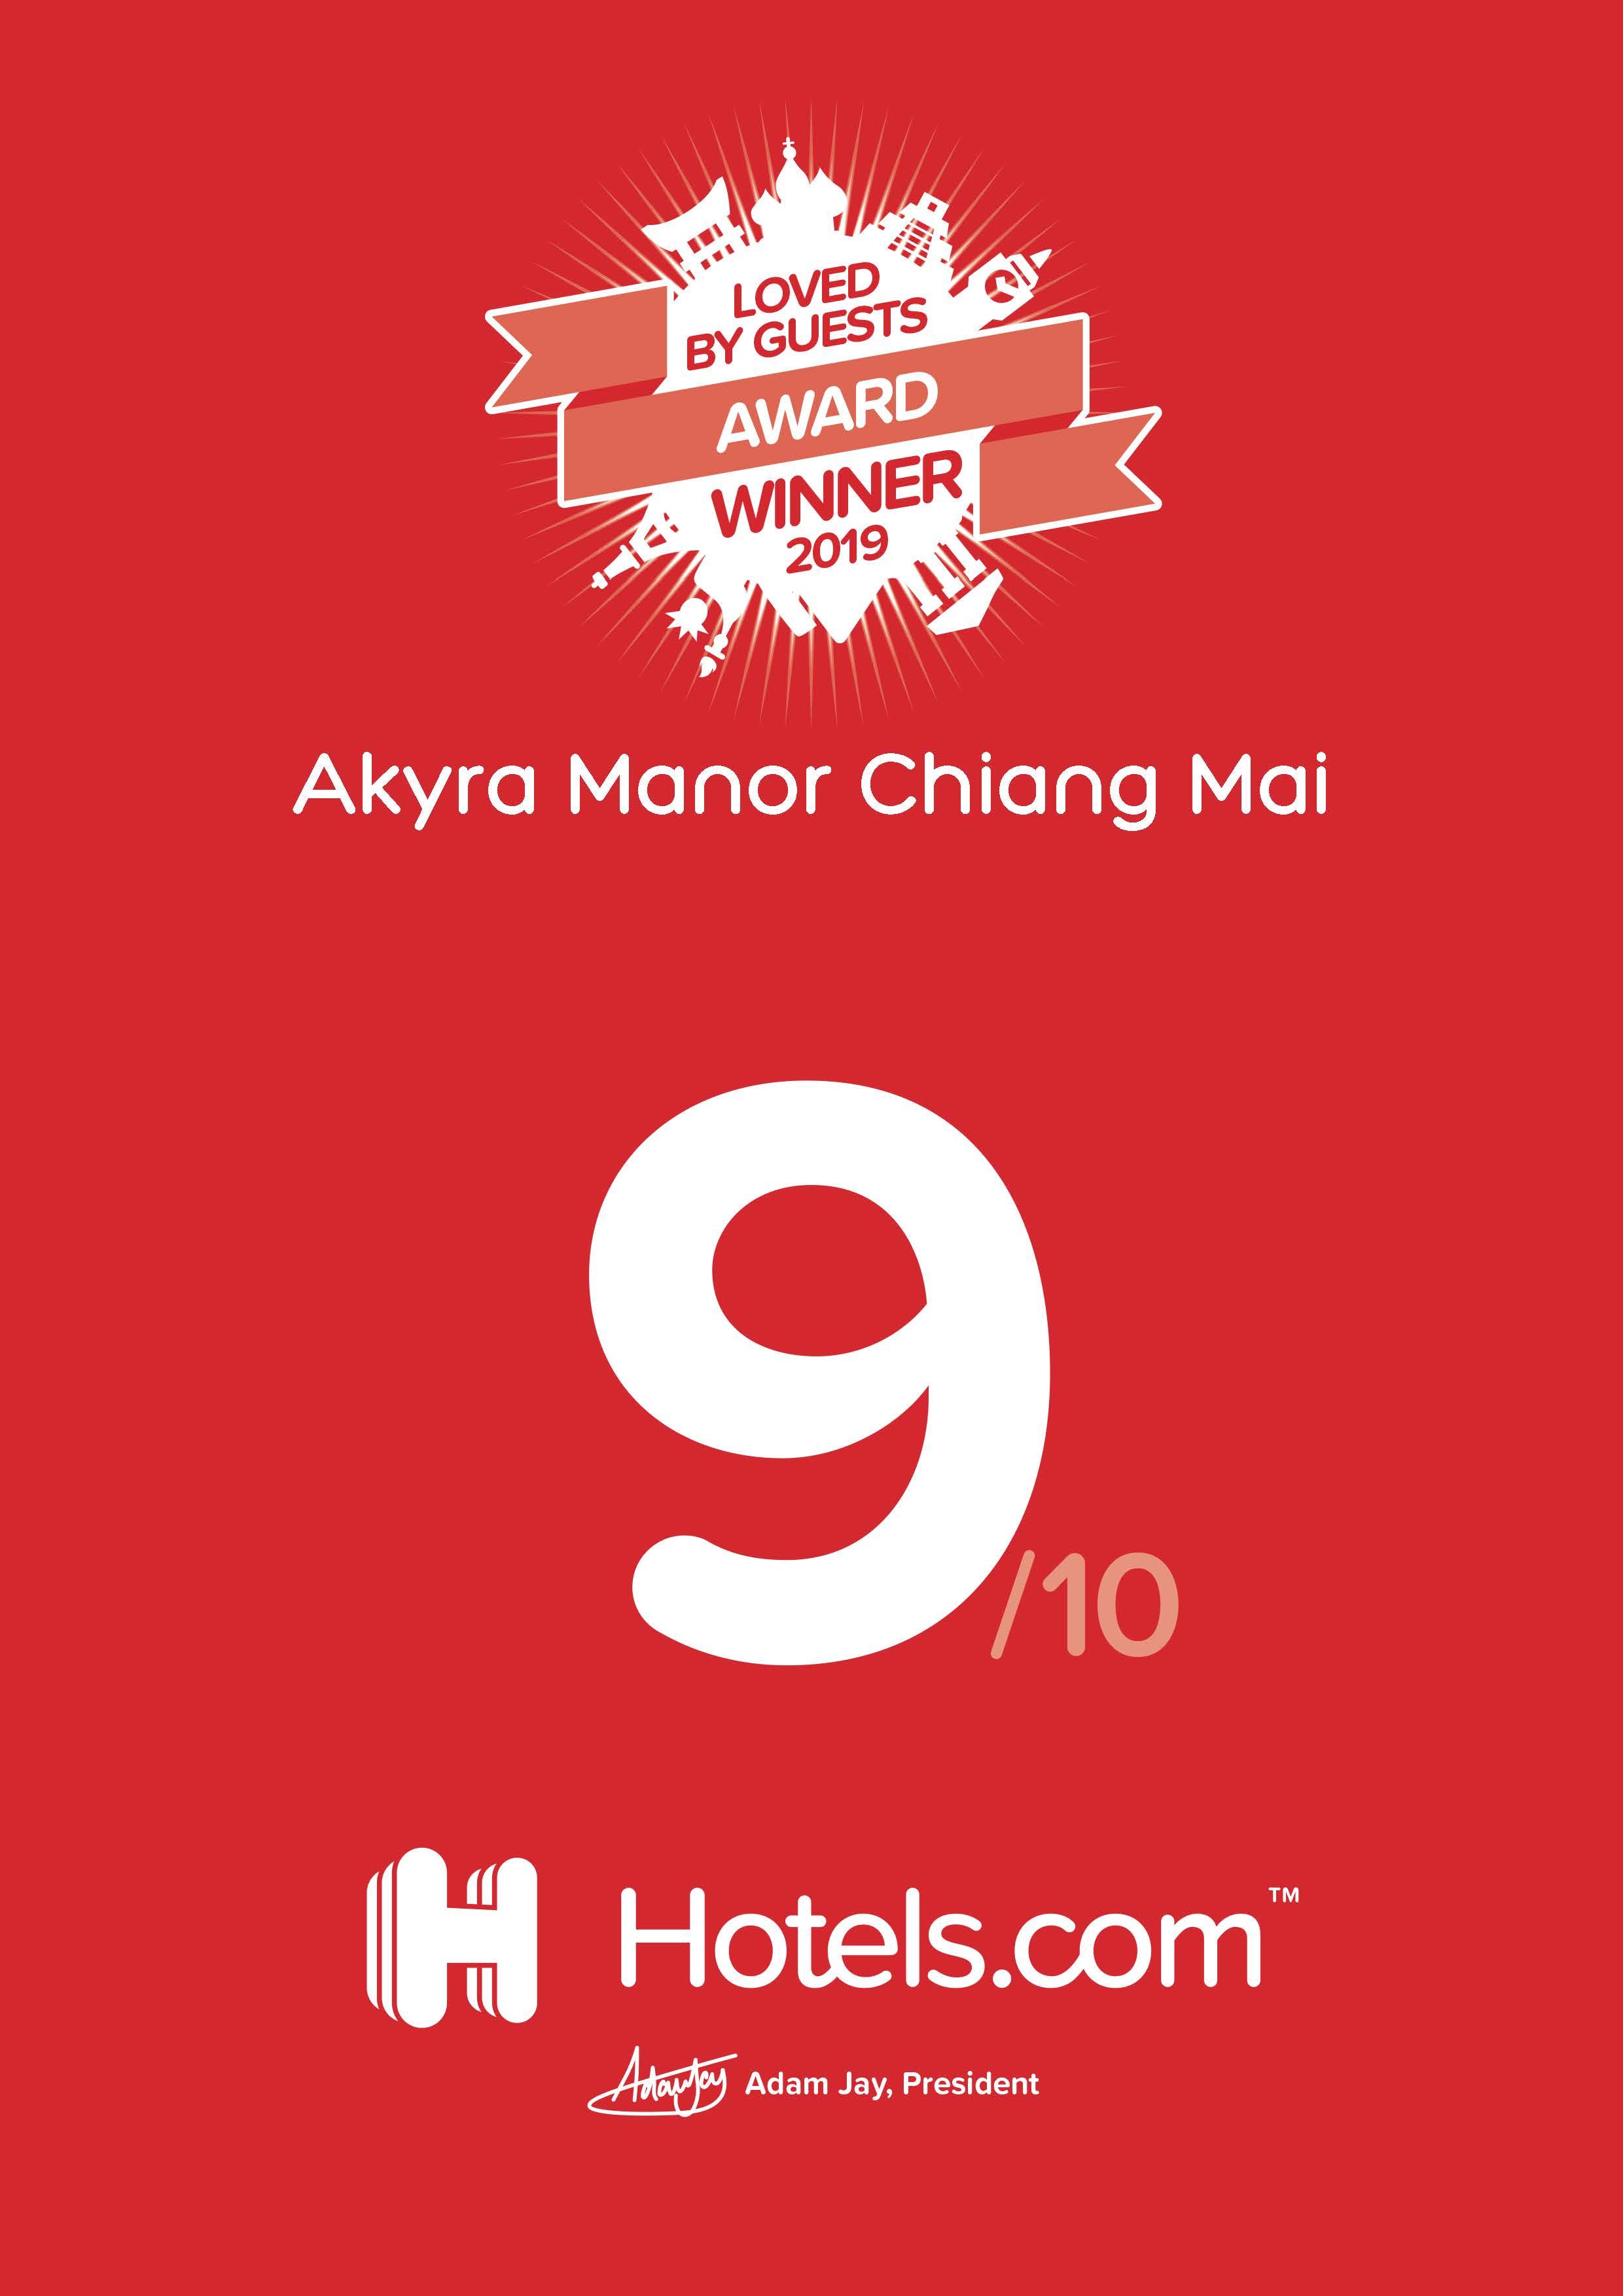 Hotels.com Award Certificate.jpg